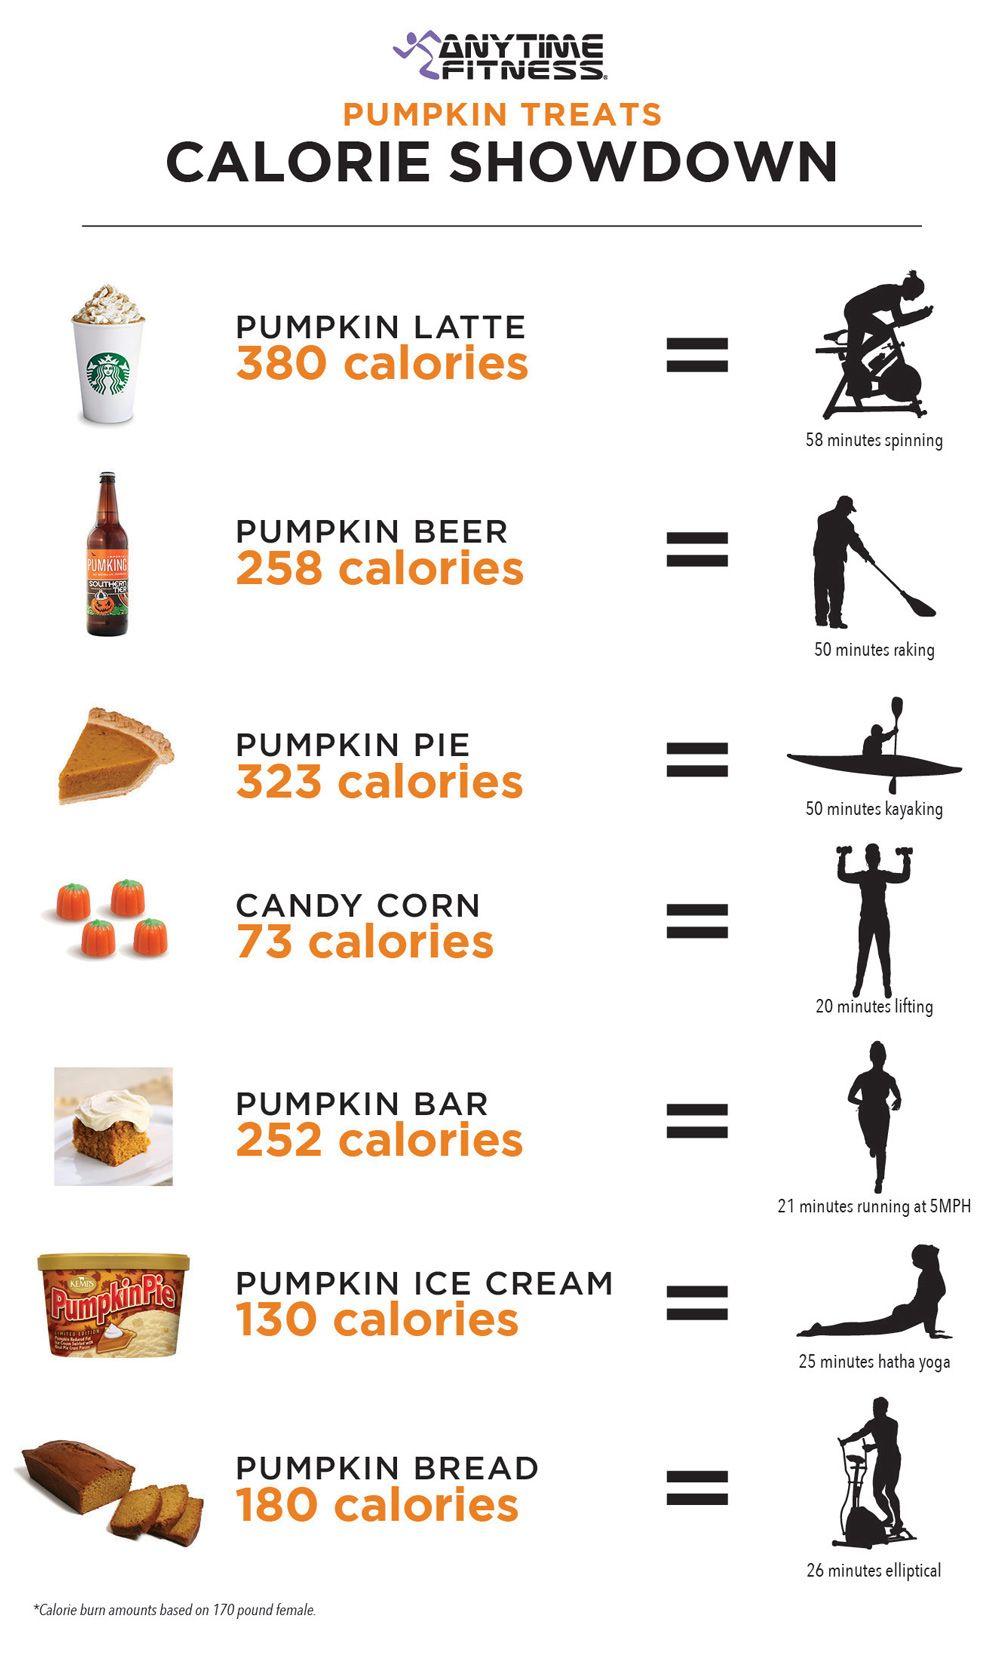 How long will it take to burn off those pumpkin treats